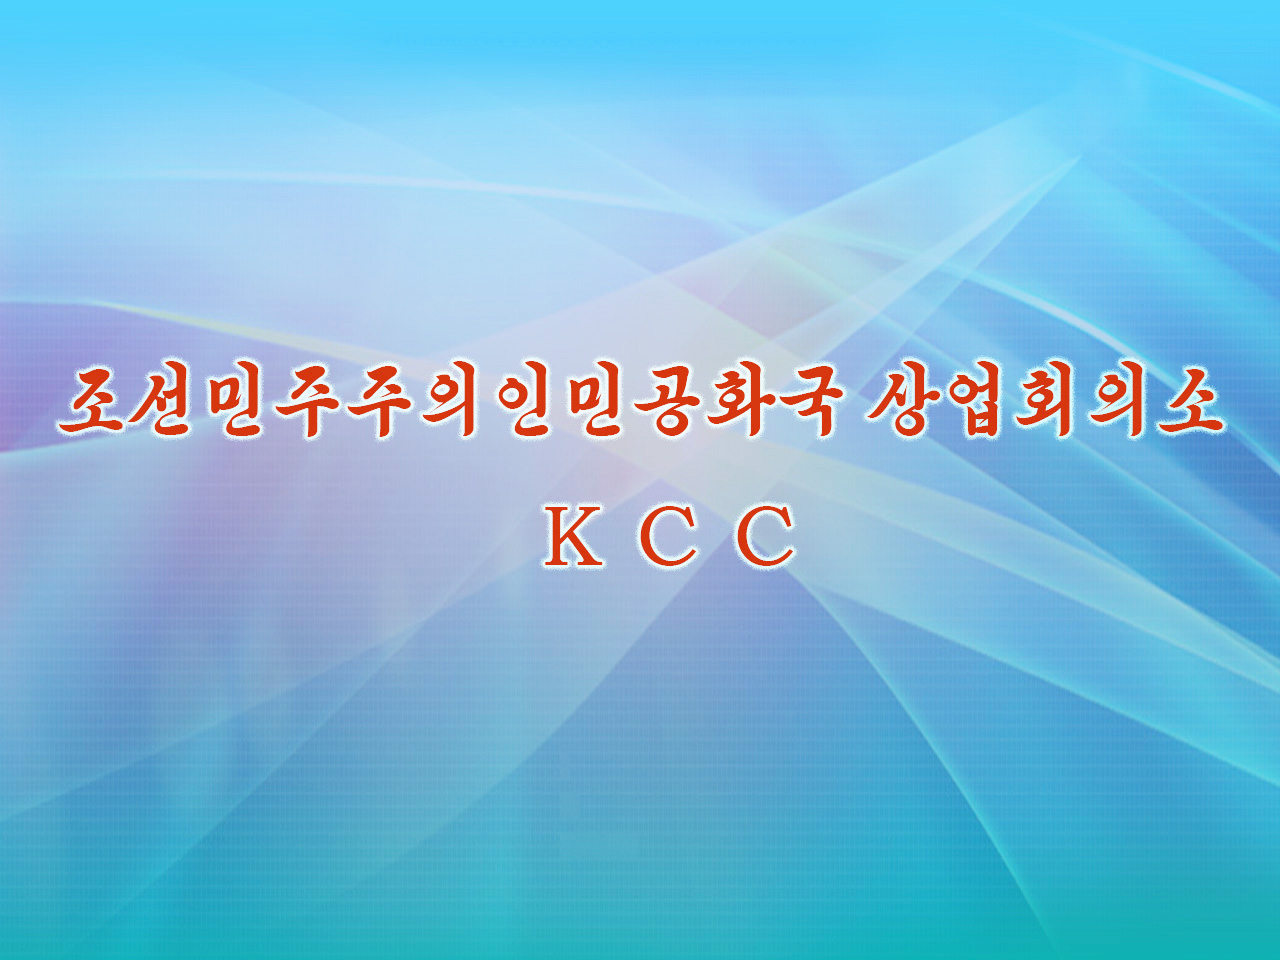 DPR Korea Chamber of Commerce (Abbreviation: KCC)